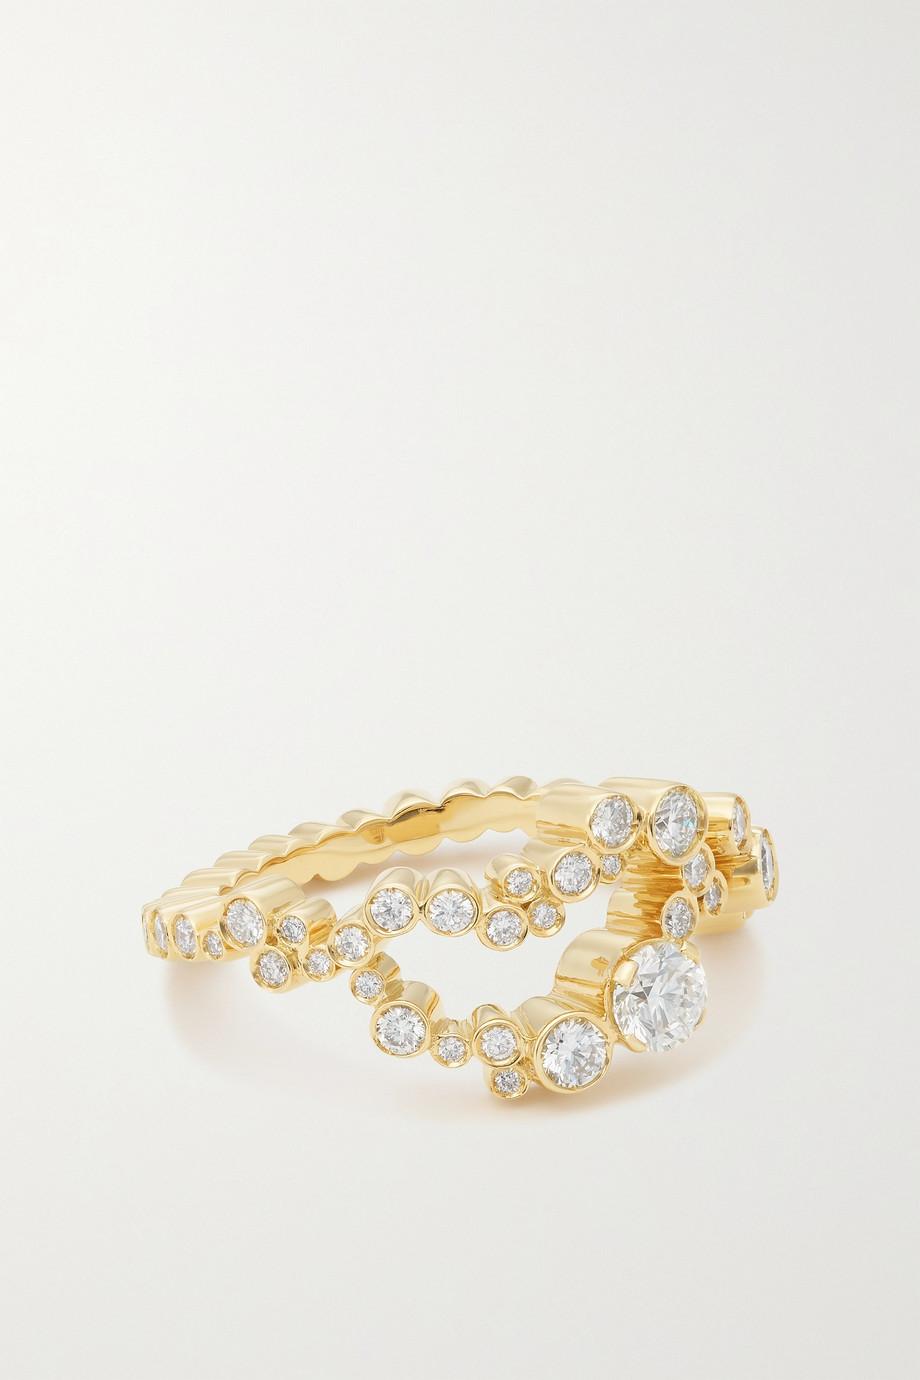 Sophie Bille Brahe Grand Splash Ring aus 18 Karat Gold mit Diamanten